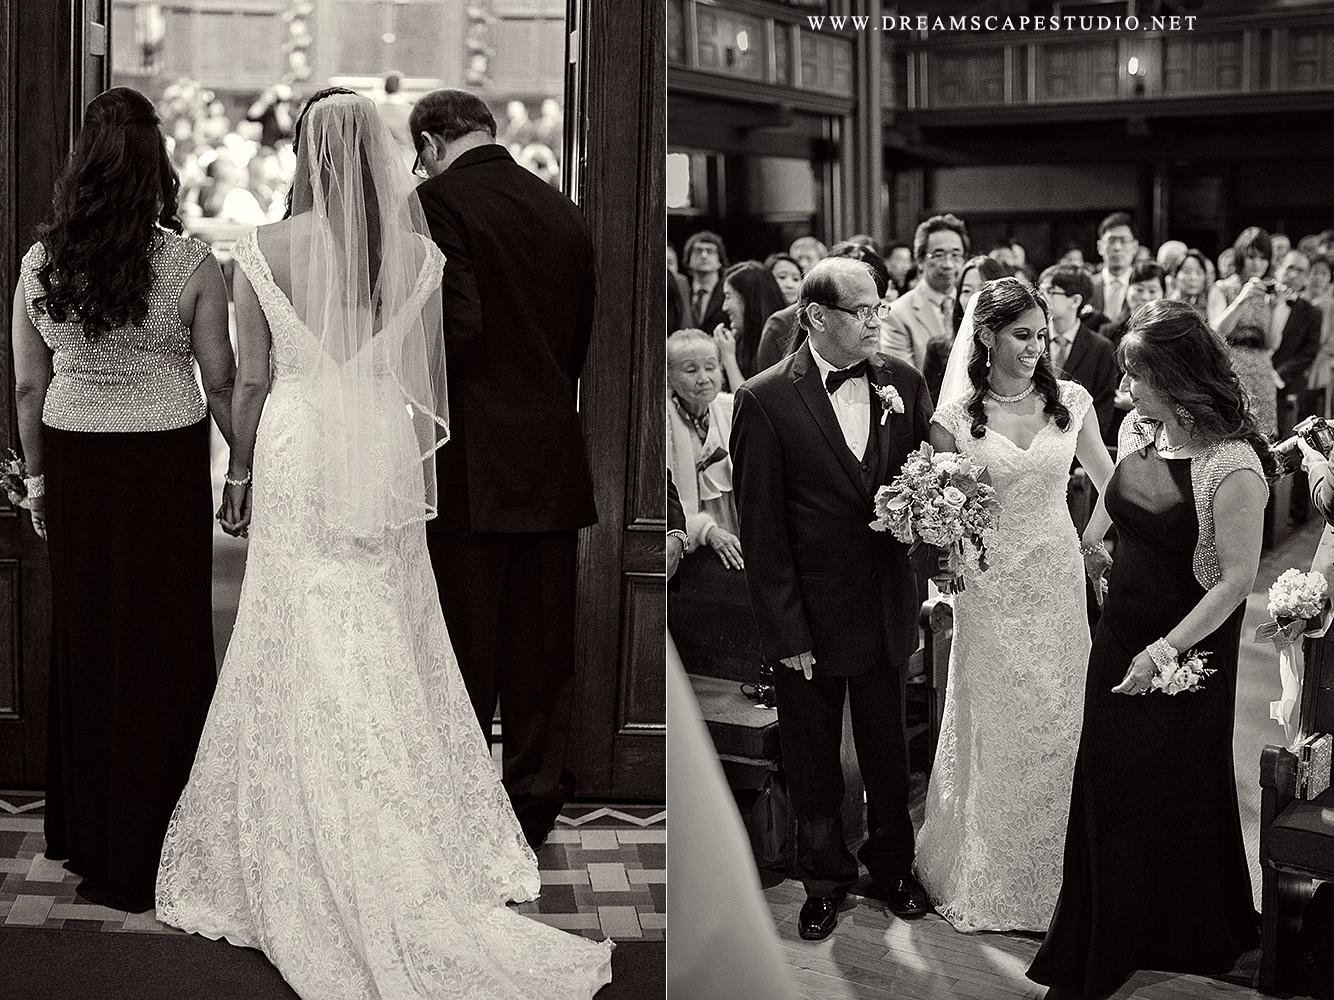 CT_Wedding_Photographer_PaHe_Blog_13.jpg